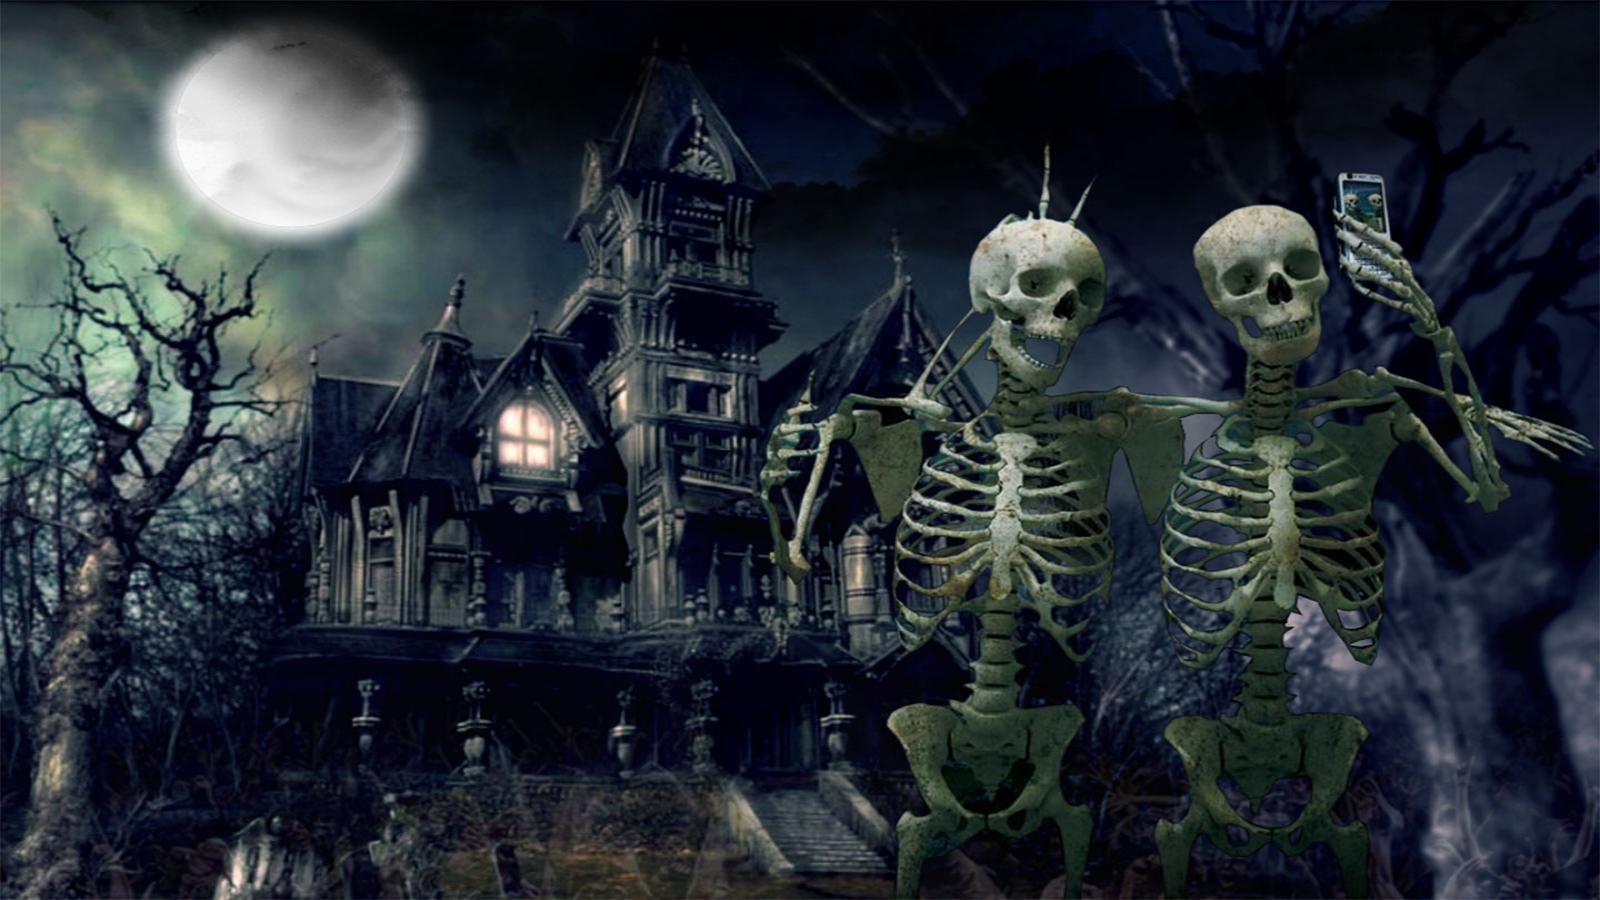 Halloween Background Hd.43 Scary Halloween Hd Wallpapers On Wallpapersafari